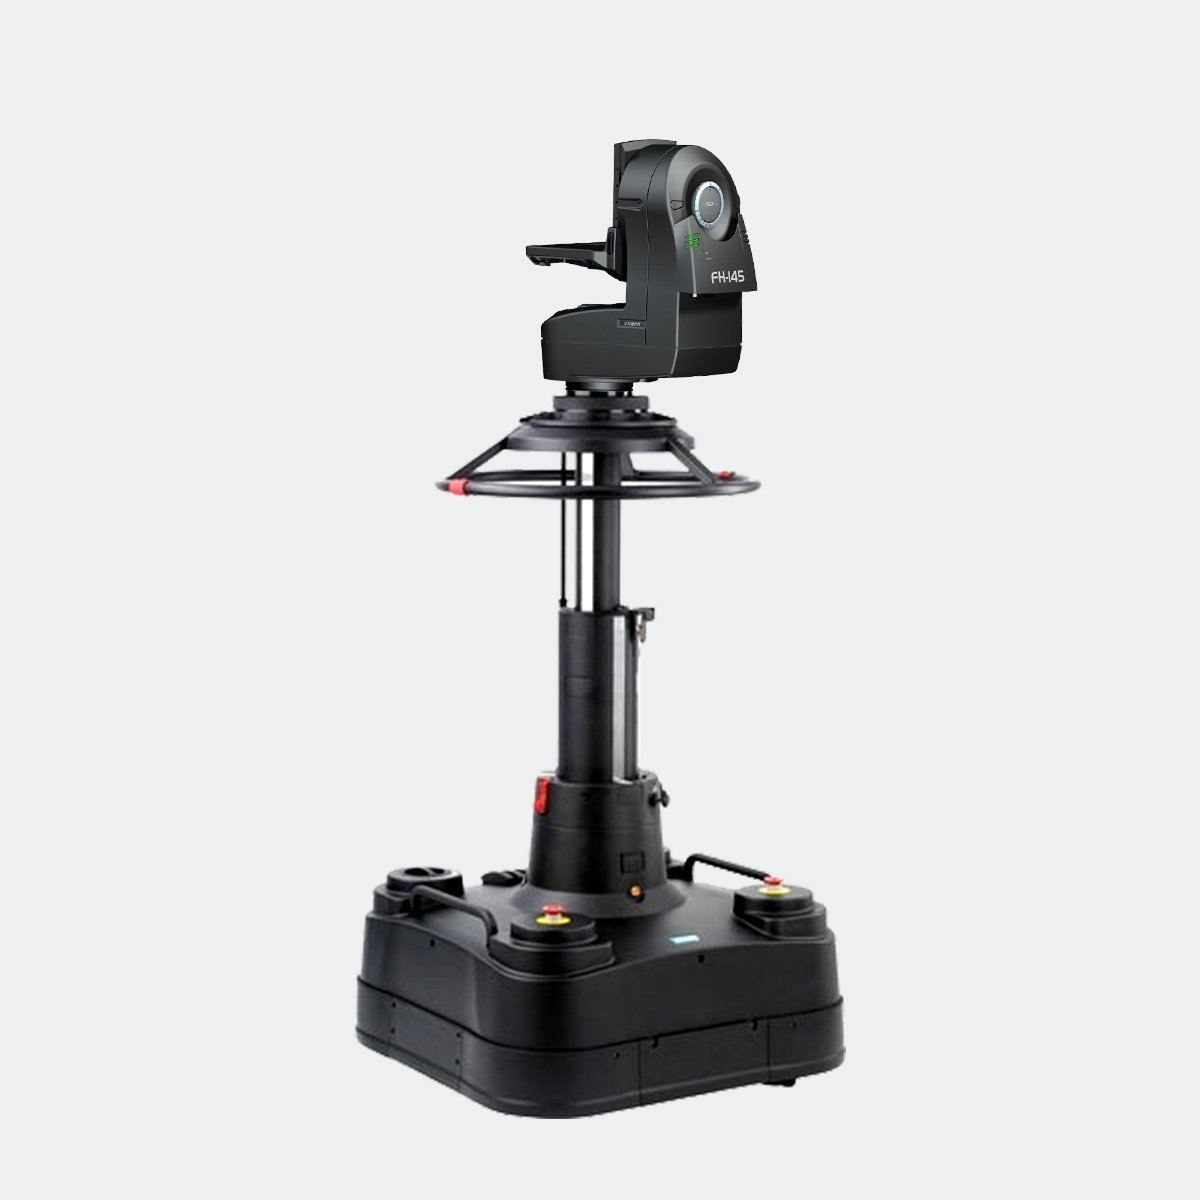 Vinten FP-188+ Pedestal with Fusion FH-145 Head System